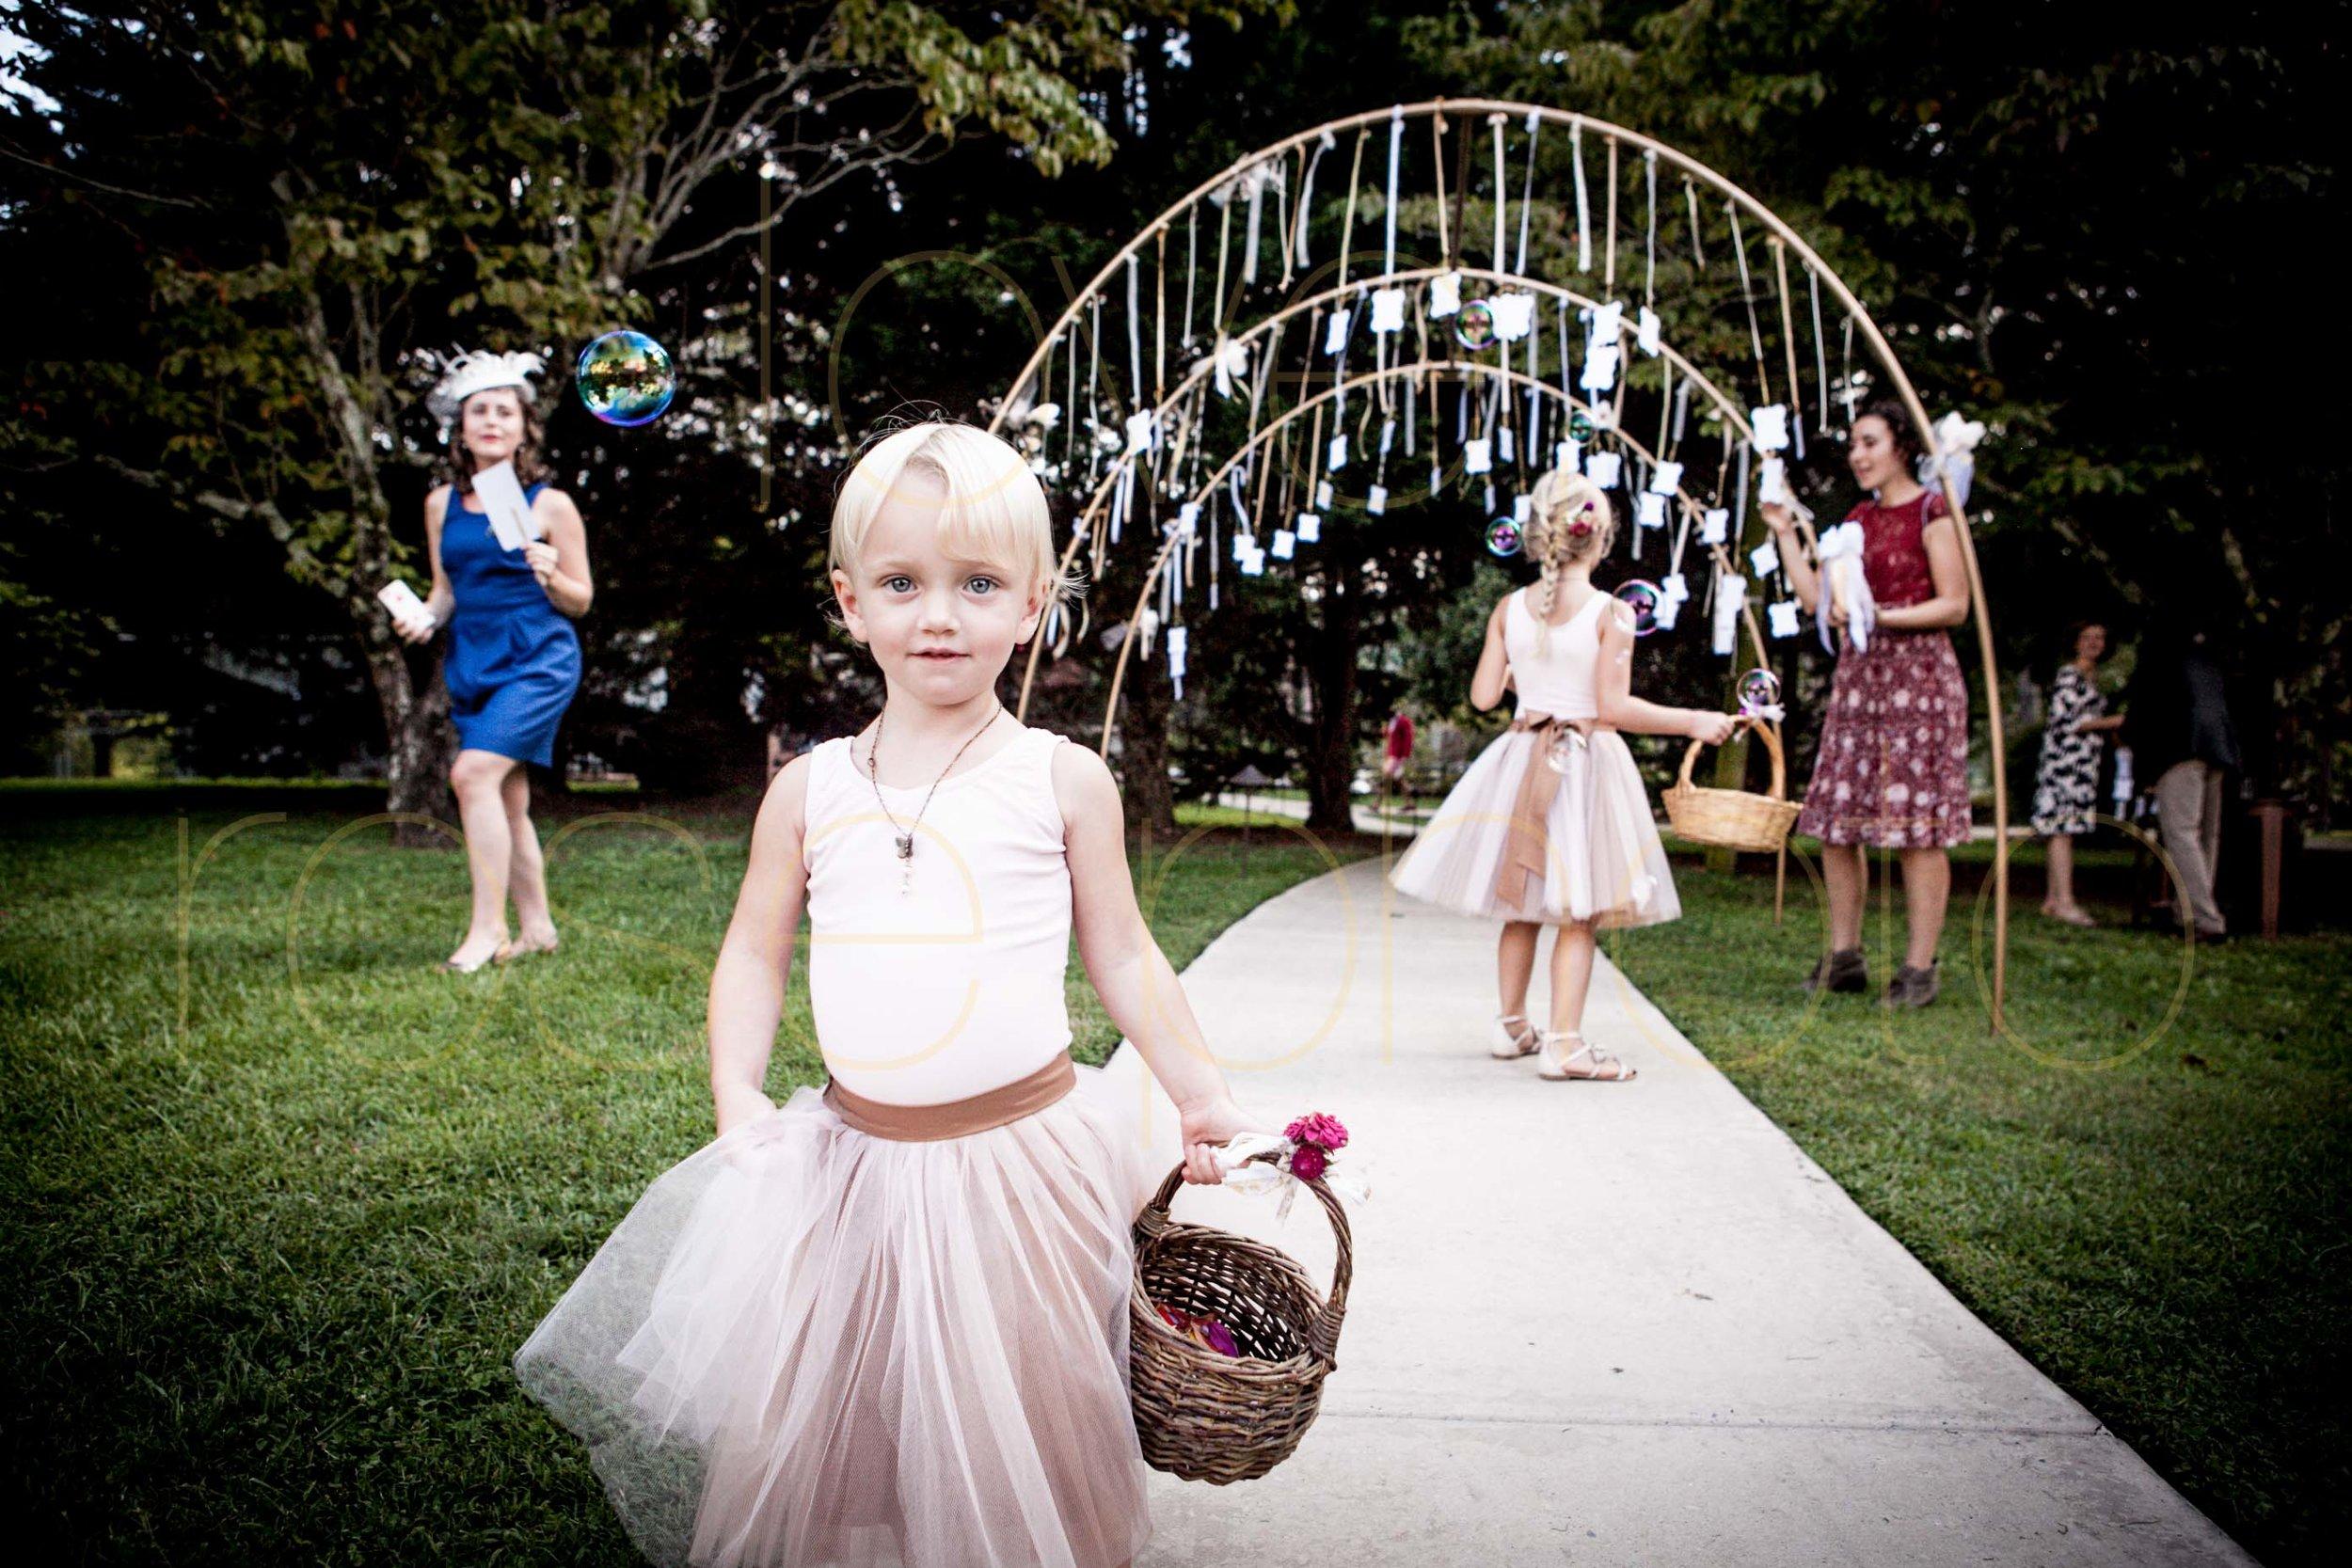 Rose Photo Asheville Wedding Photographer Nasheville Weddings Charleston Bride Chicago photojournalist weddings -33.jpg